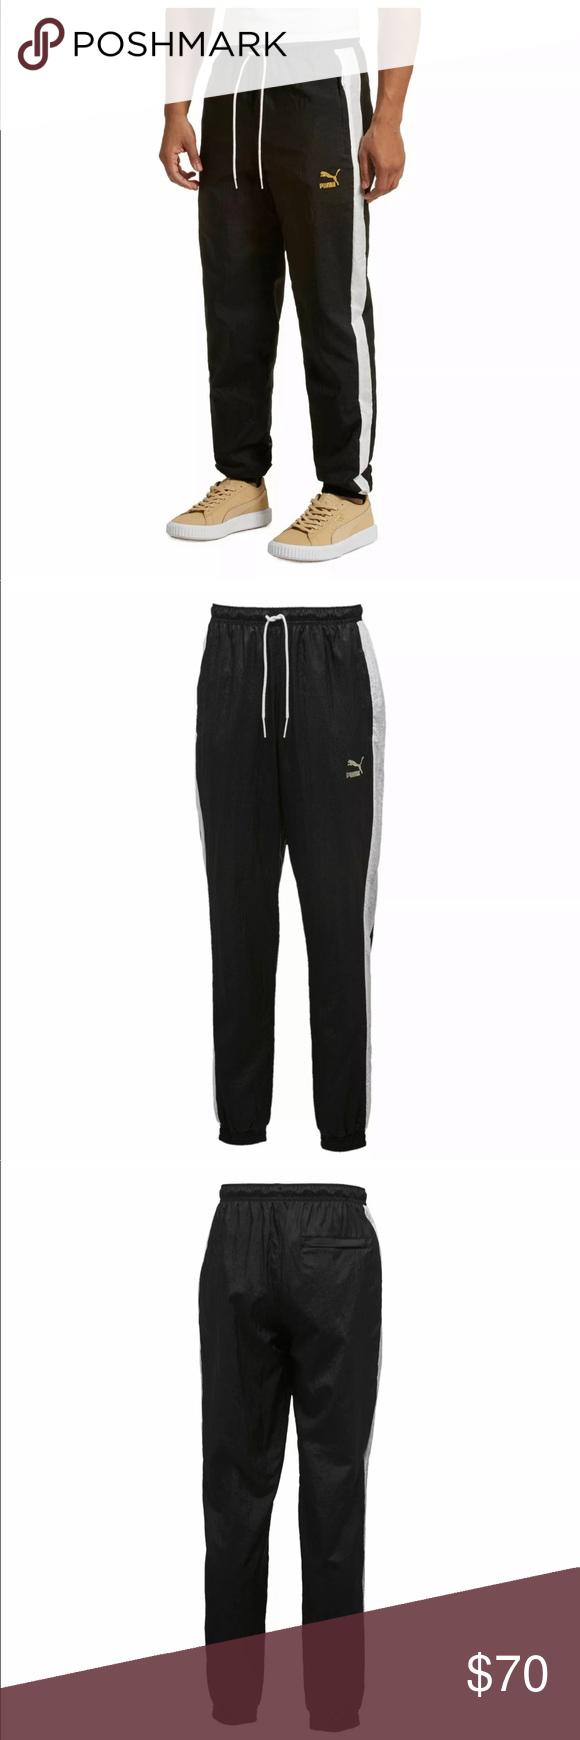 estoy feliz Deportes Hamburguesa  New! Mens Puma T7 BBoy Track Pants   Pants, Track pants, Men